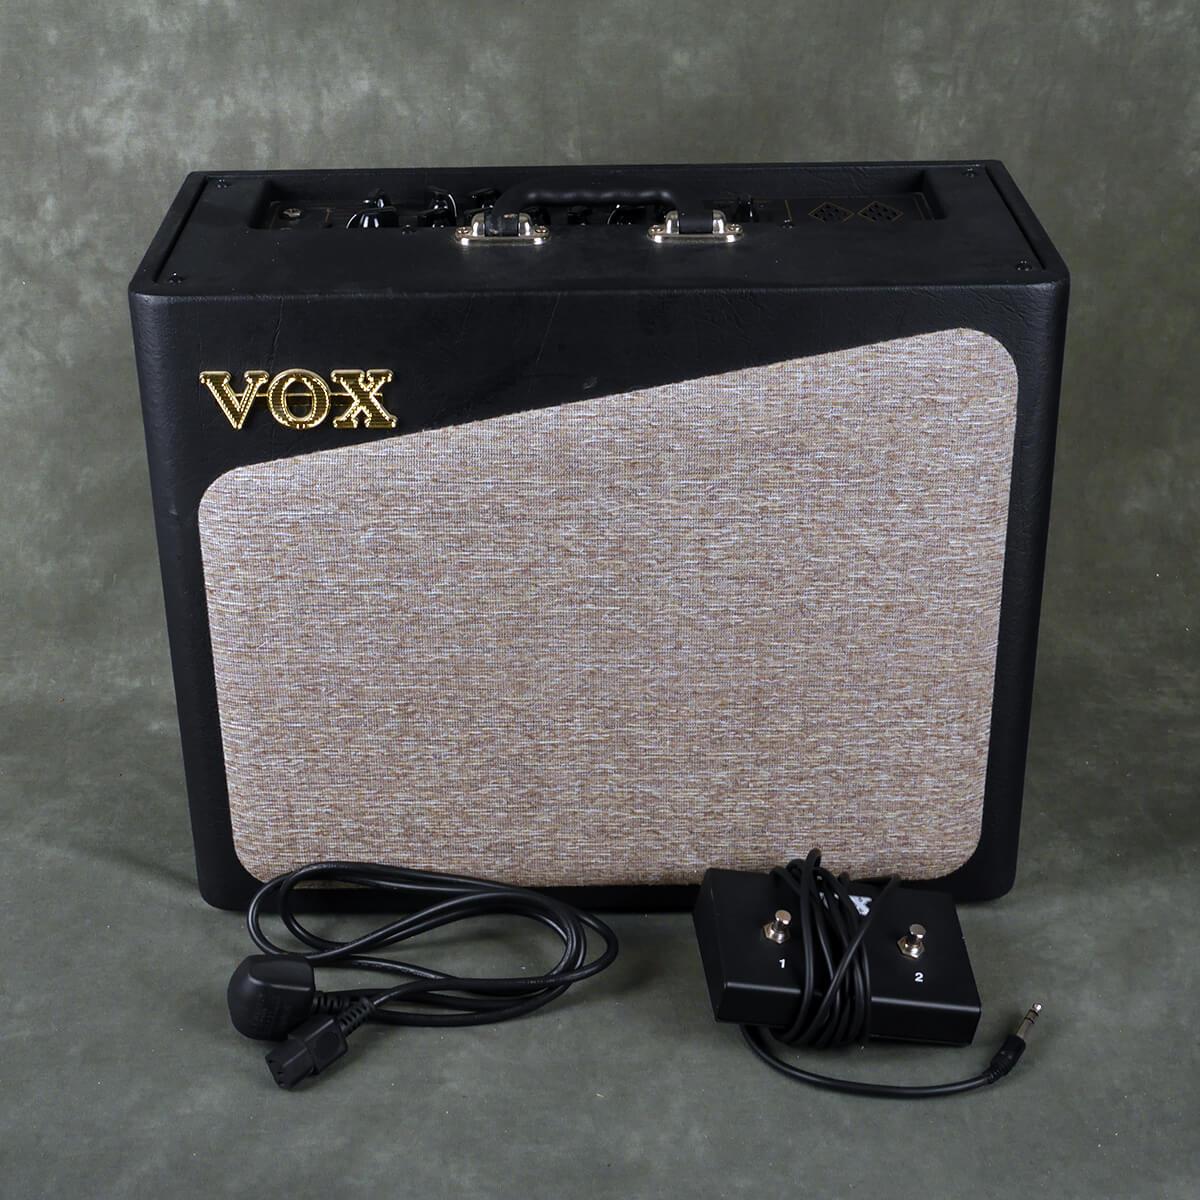 Vox AV30 Combo Amplifier & Footswitch - 2nd Hand